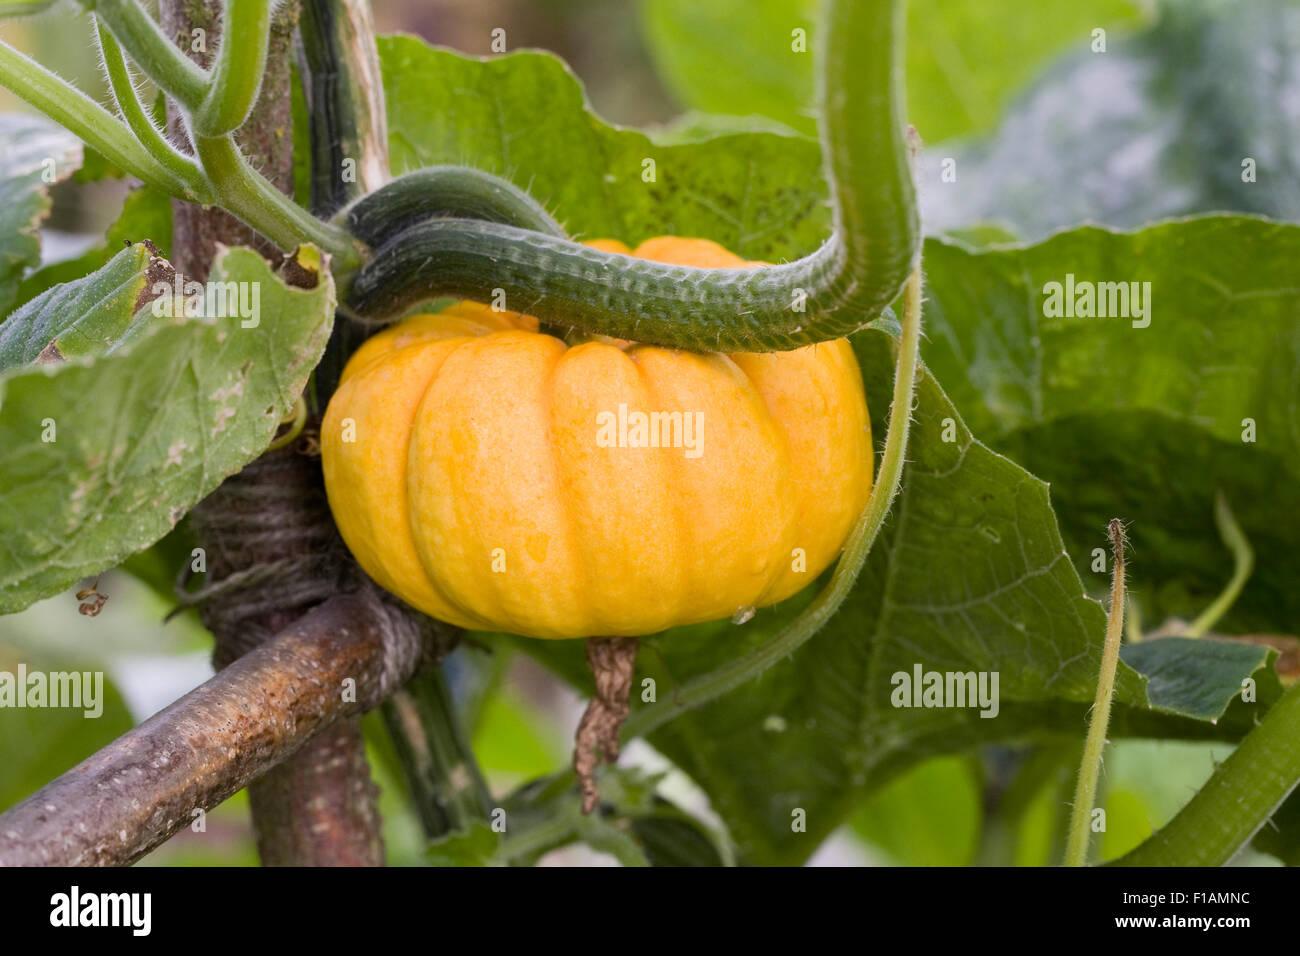 Squash munchkin growing up a frame. - Stock Image